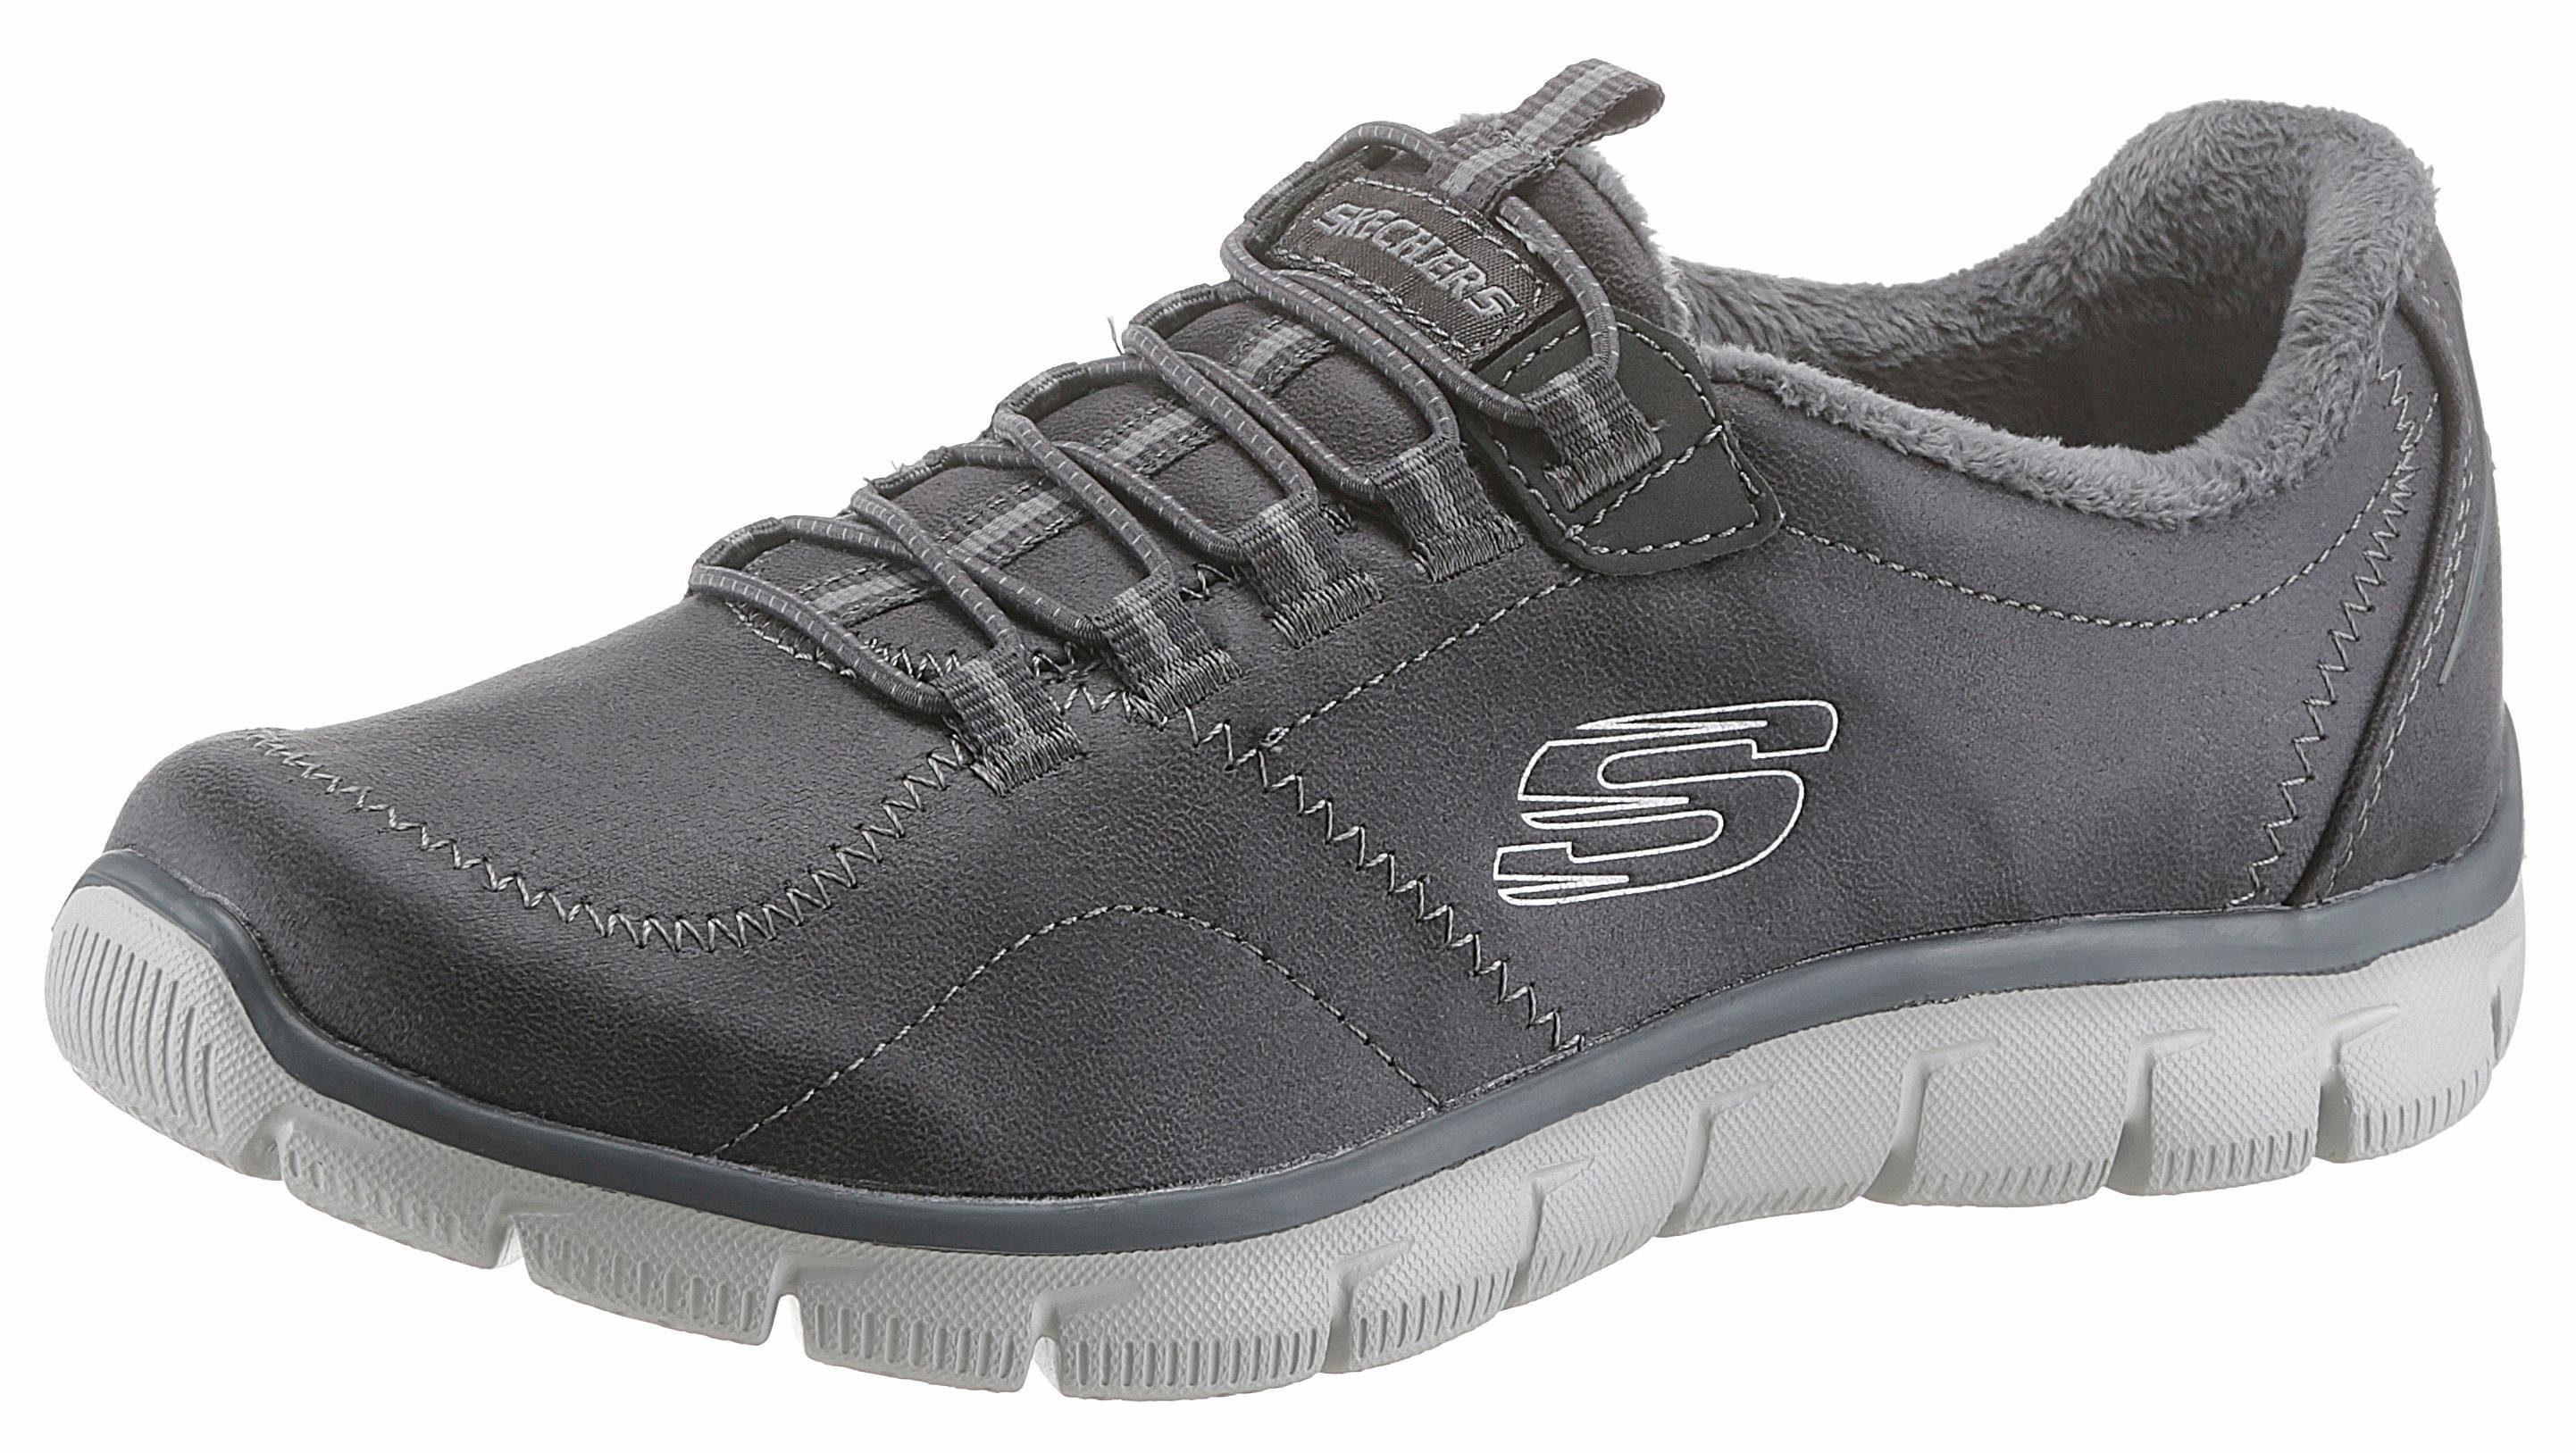 Skechers »Empire-Latest News« Slipper, mit Relaxed Fit-Ausstattung, grau, 40 40